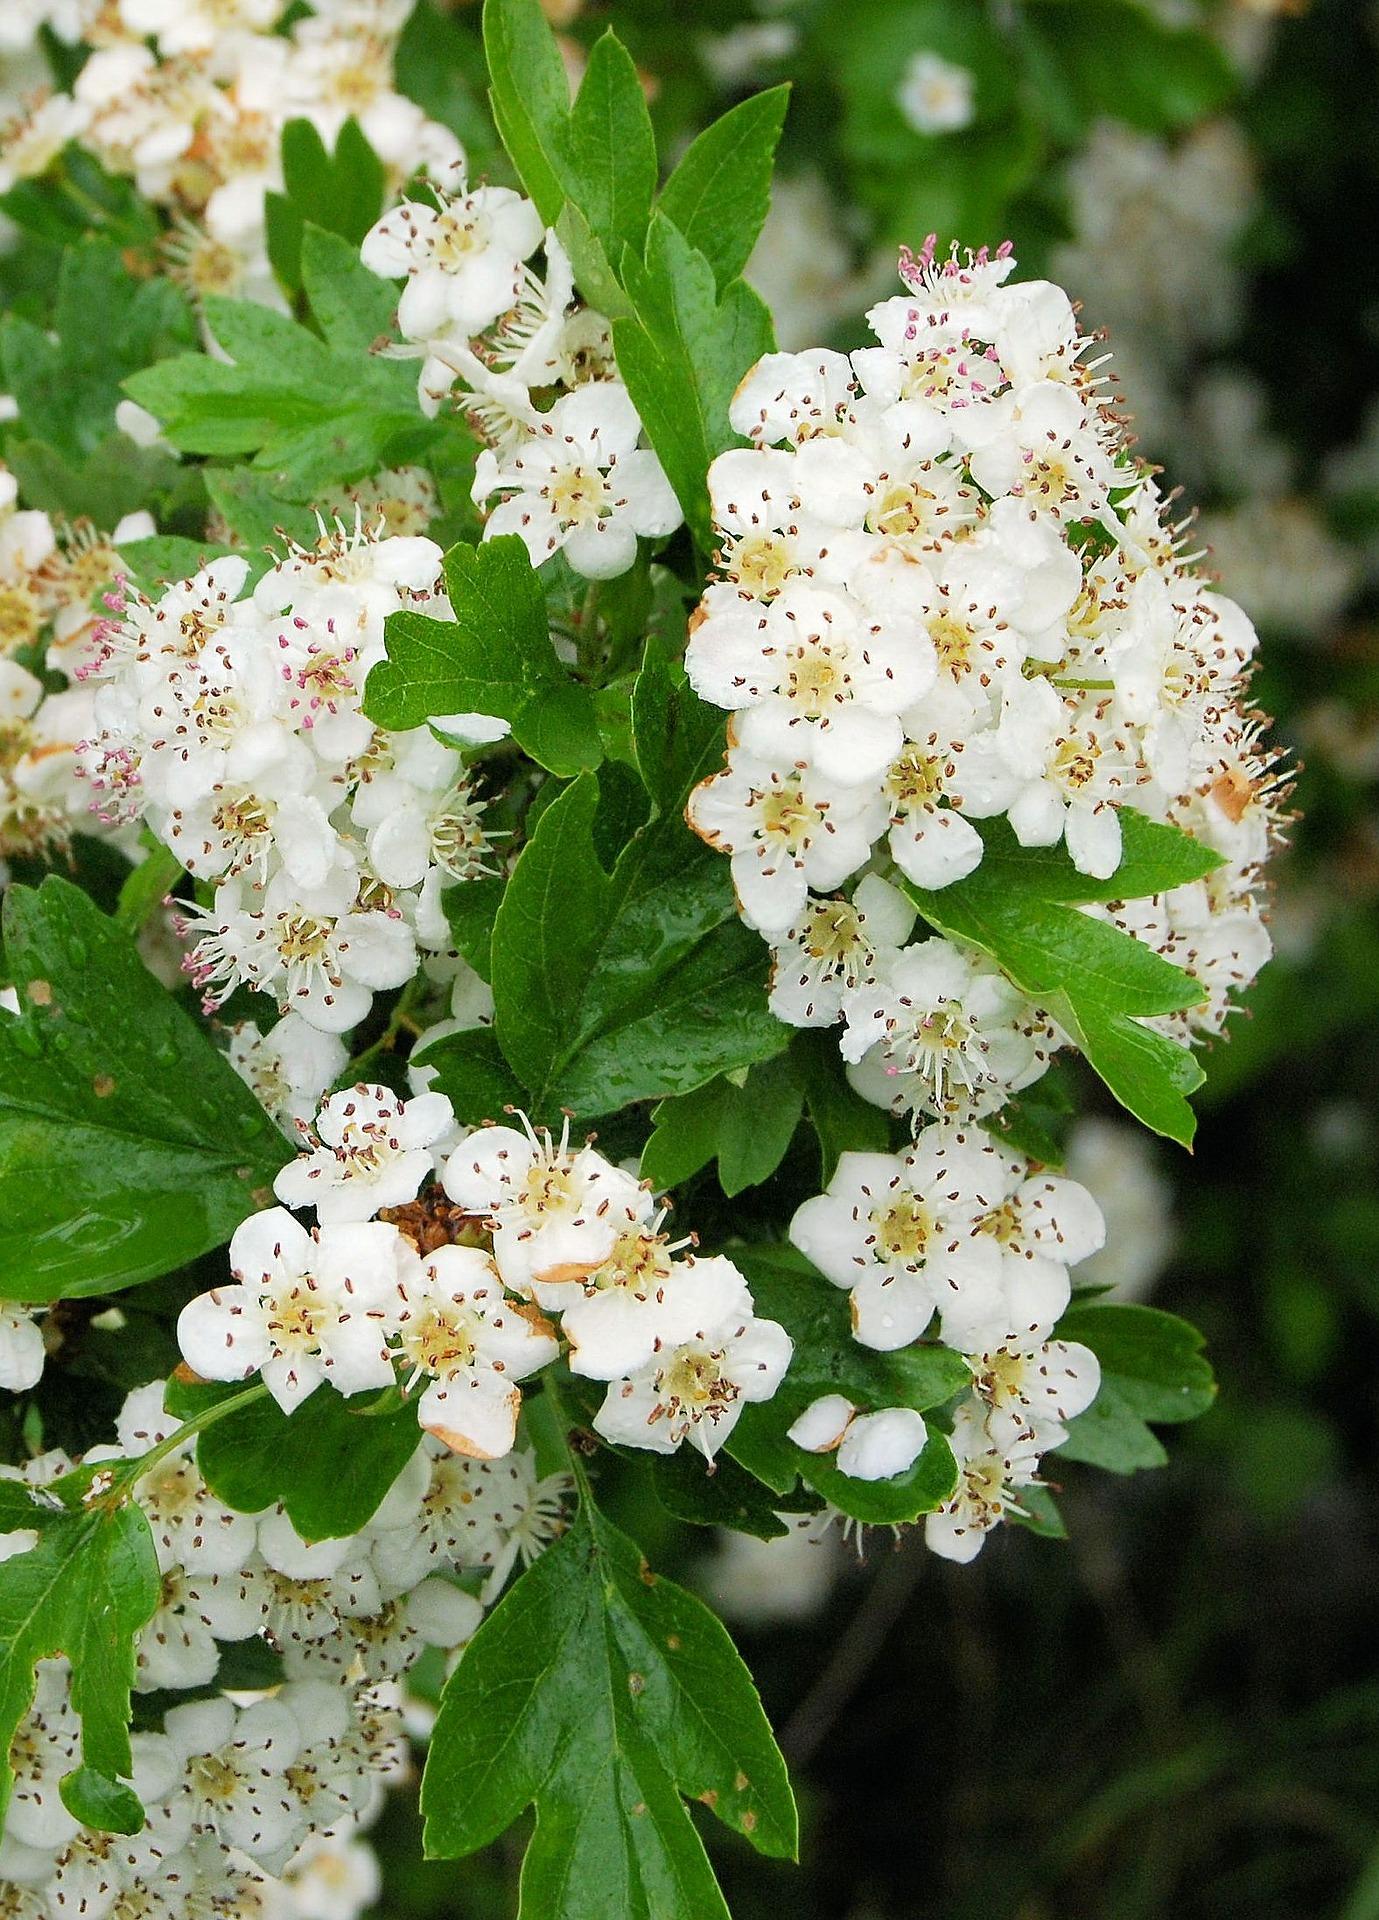 Medicinal Hawthorn Flowers